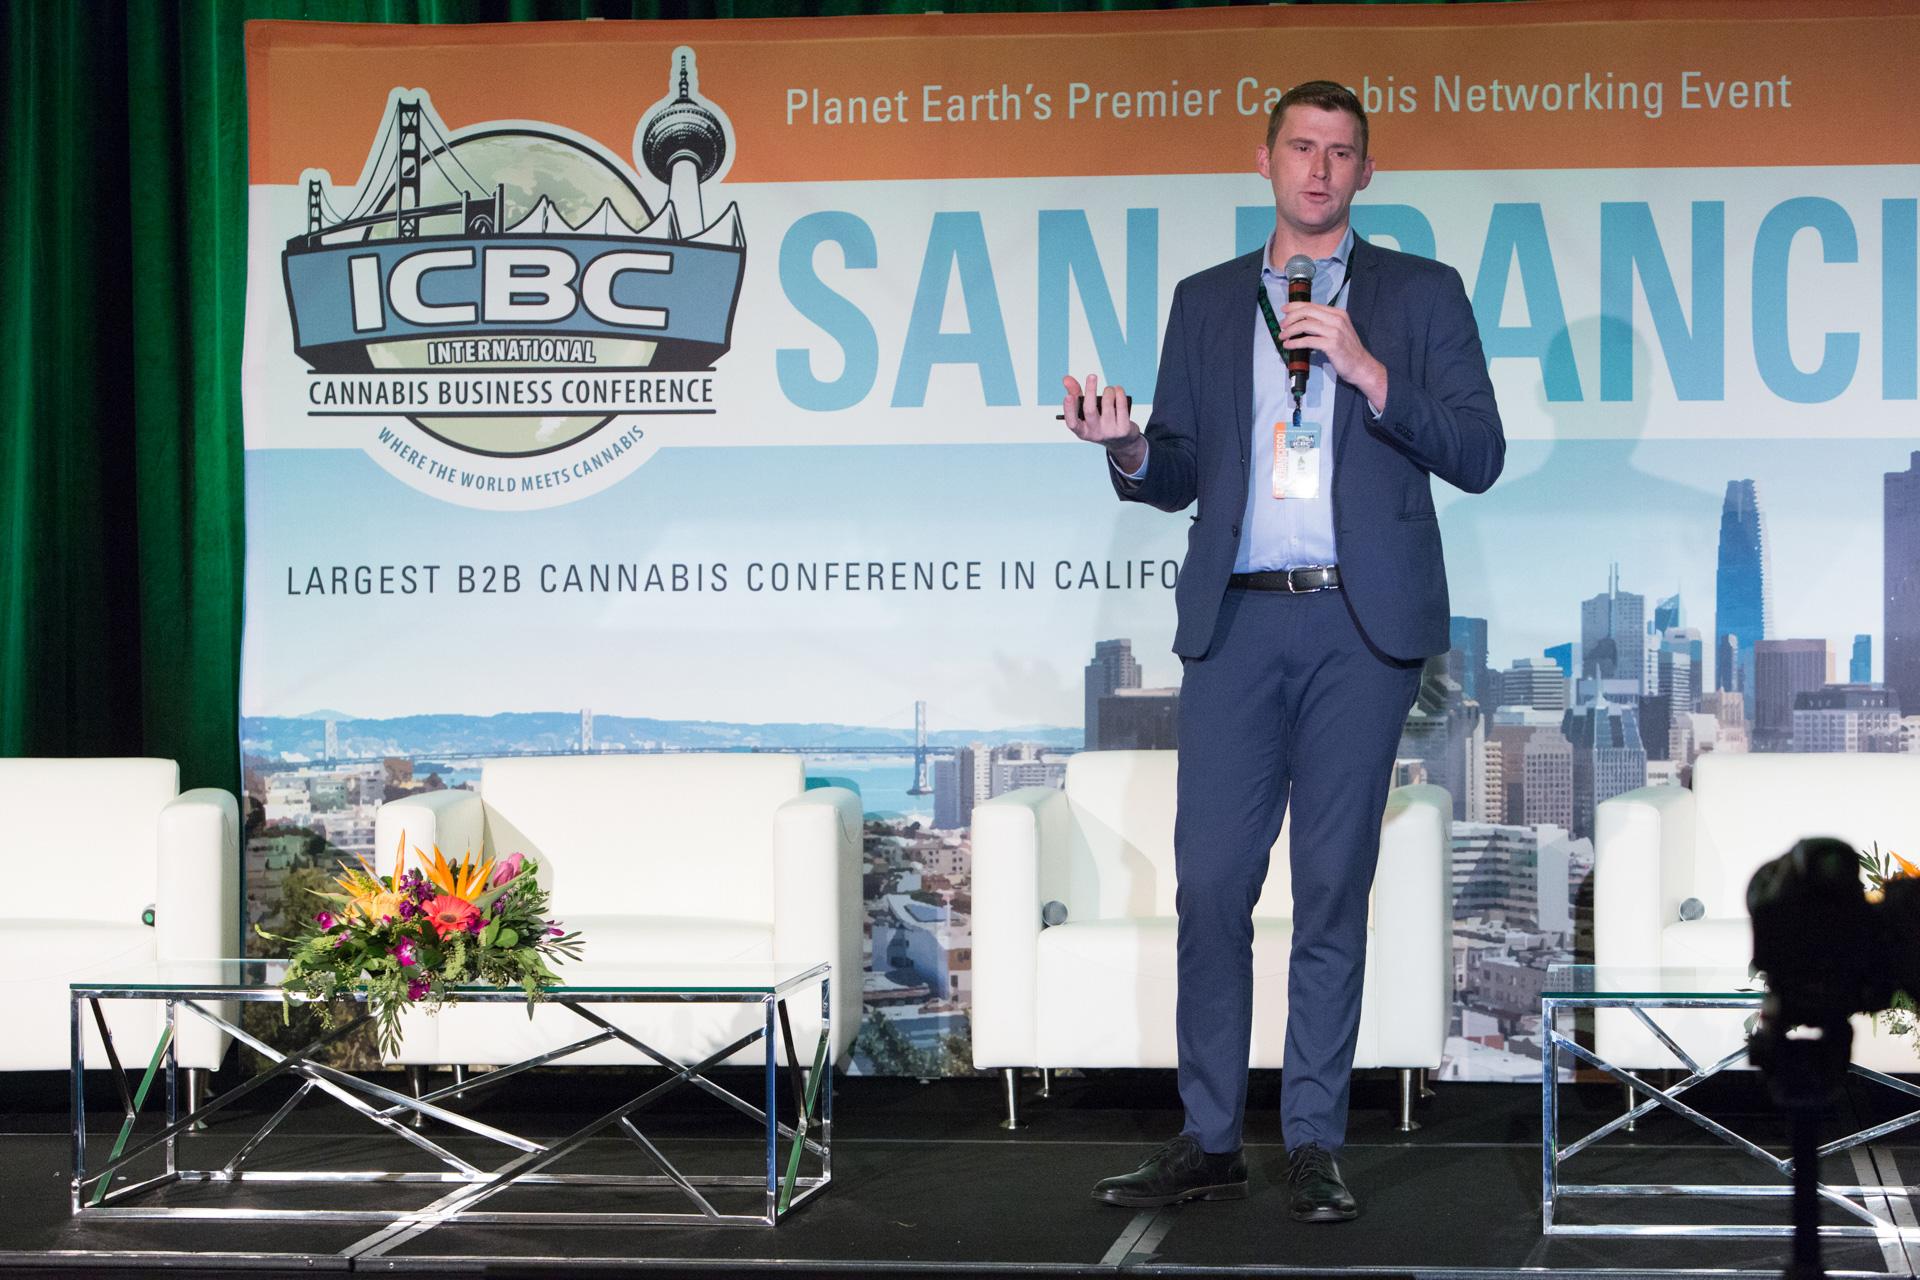 InternationalCBC-San-Francisco-2020-24